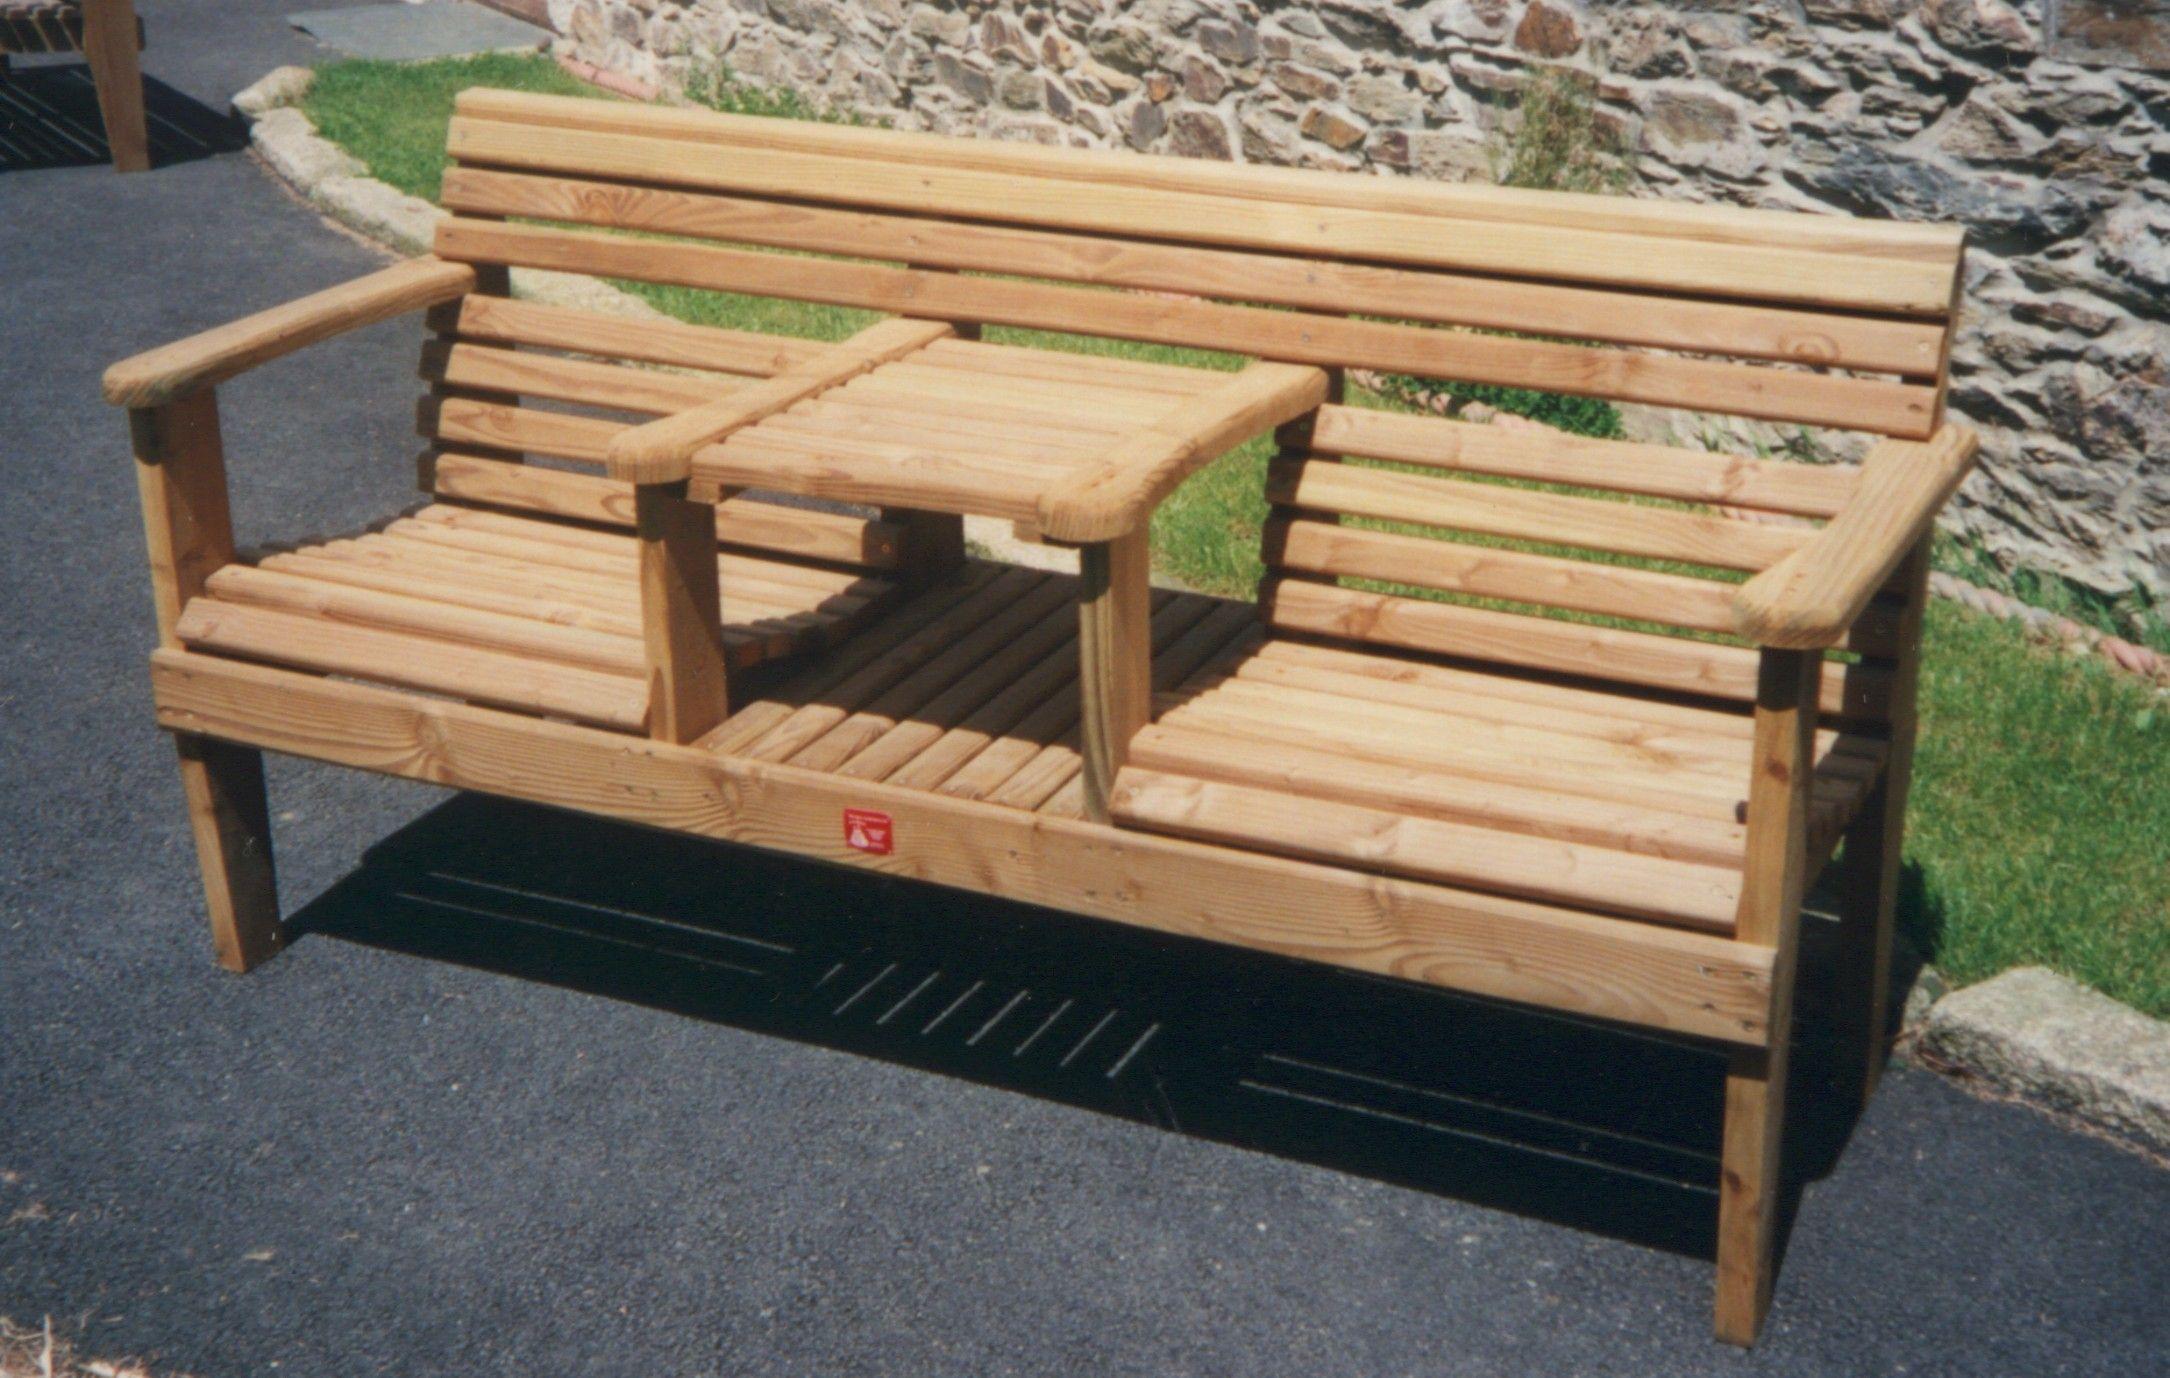 Pallet Furniture Plans | INTERGRATED BENCH 01